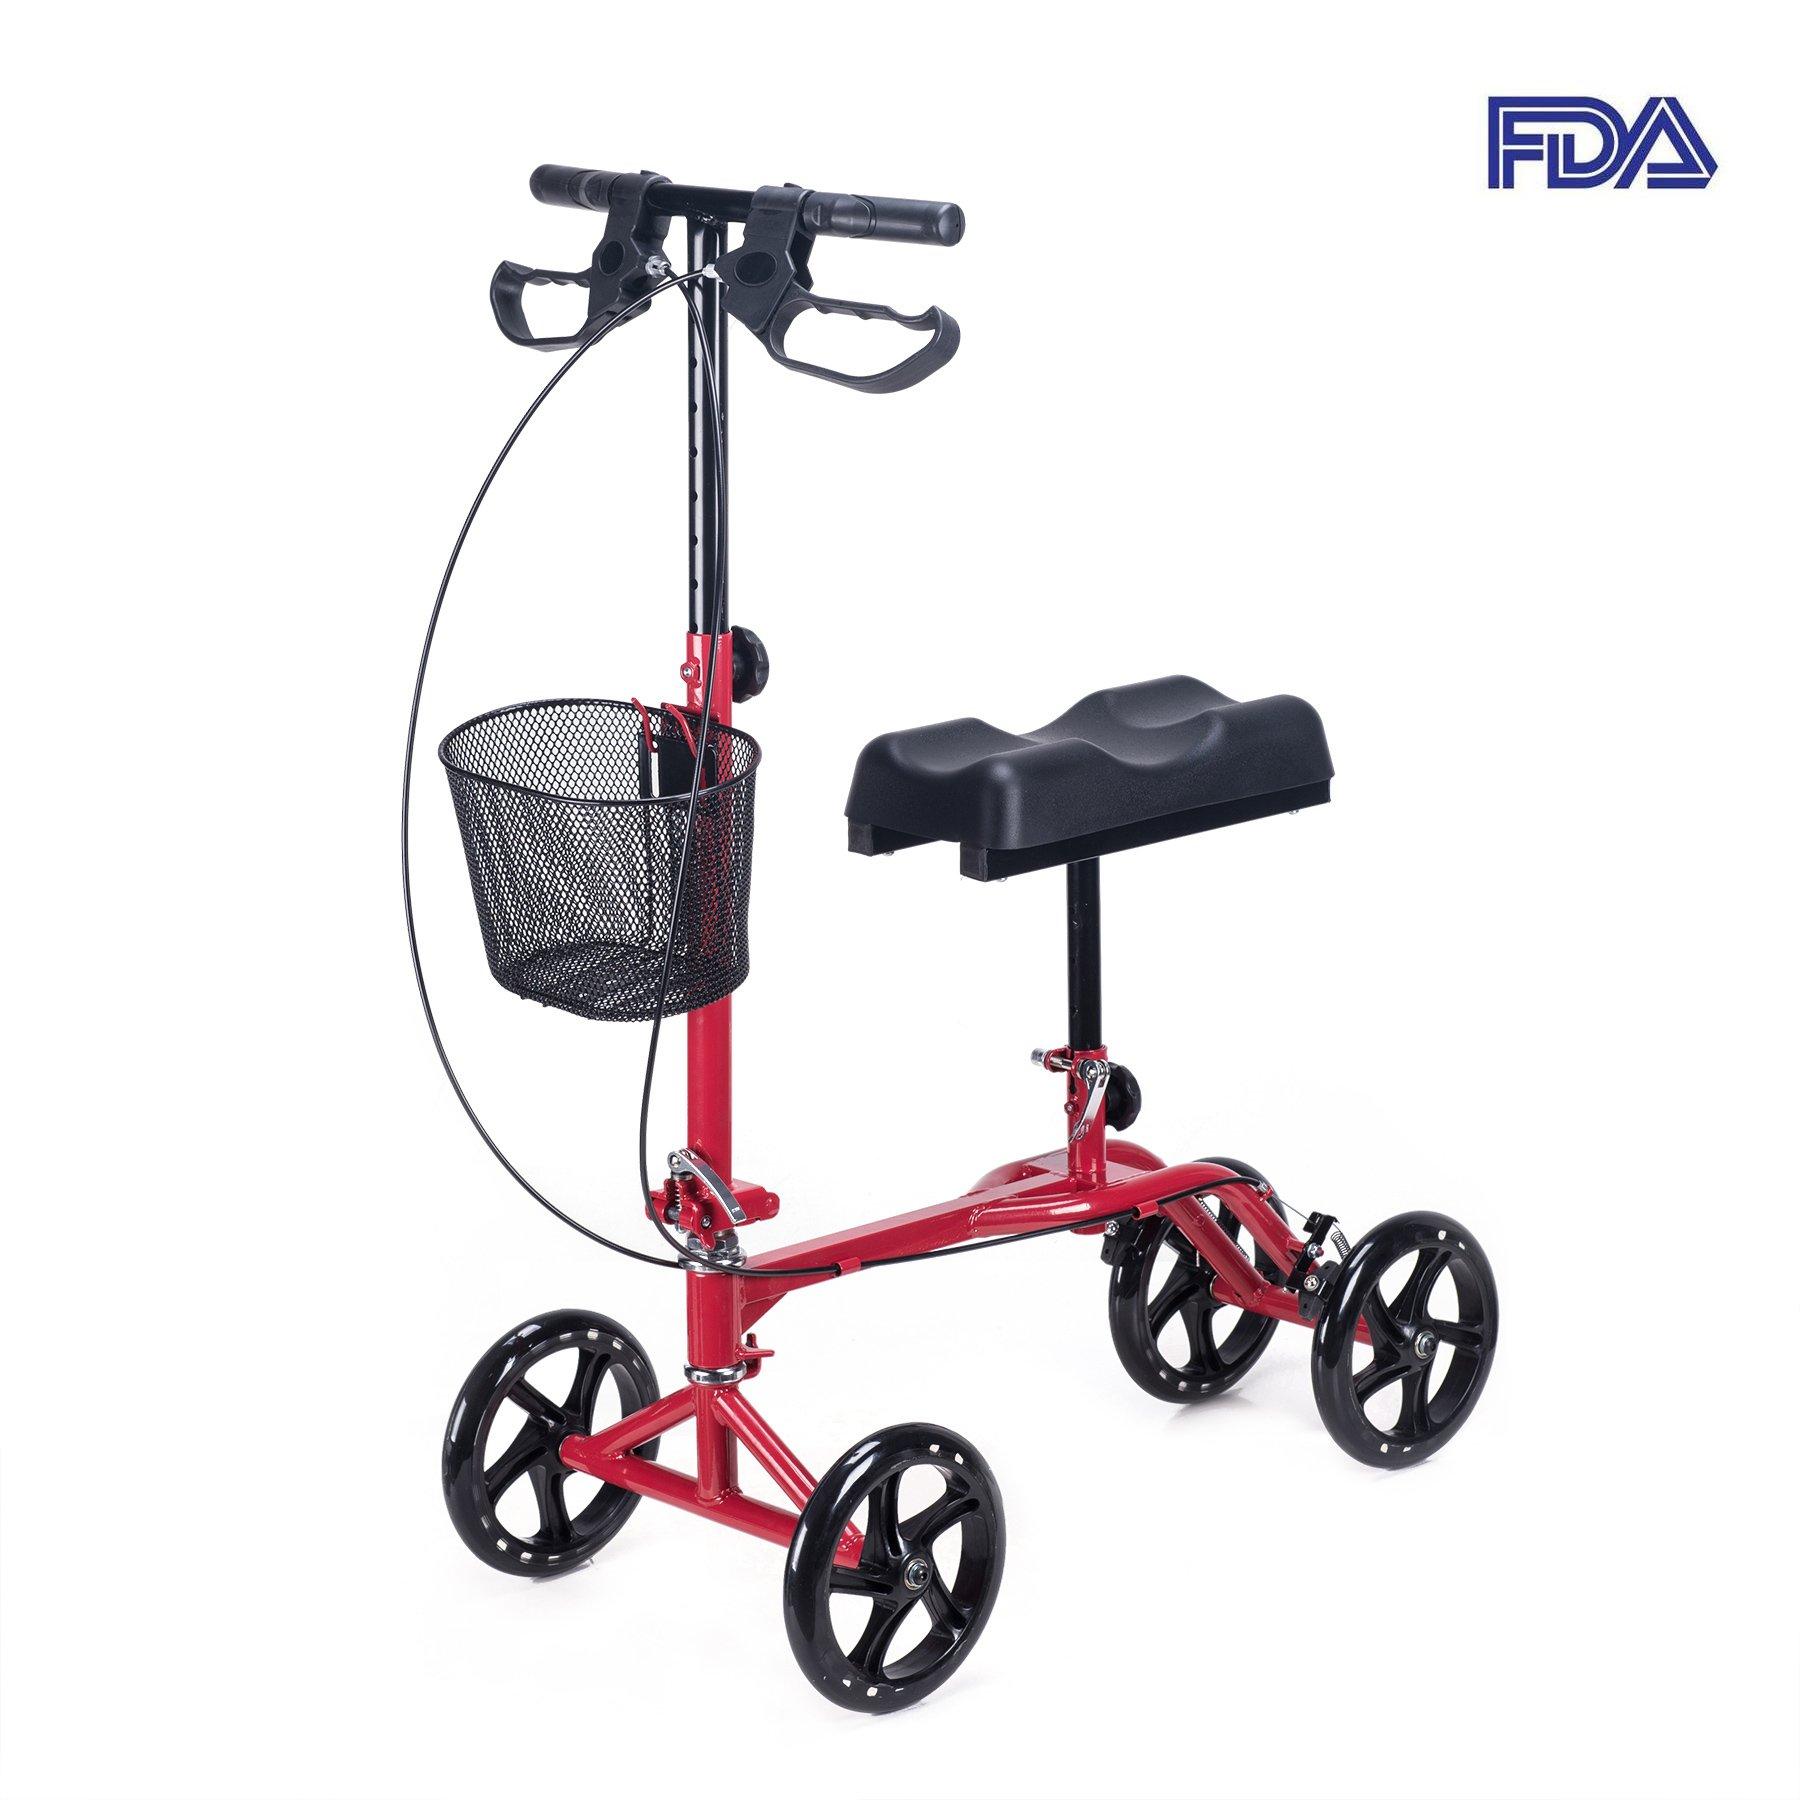 CO-Z Steerable Foldable Knee Walker Roller Scooter with Basket, 8'' Antiskid Rubber Wheels, Safety Double Brakes, Leg Walker Crutch (Red)